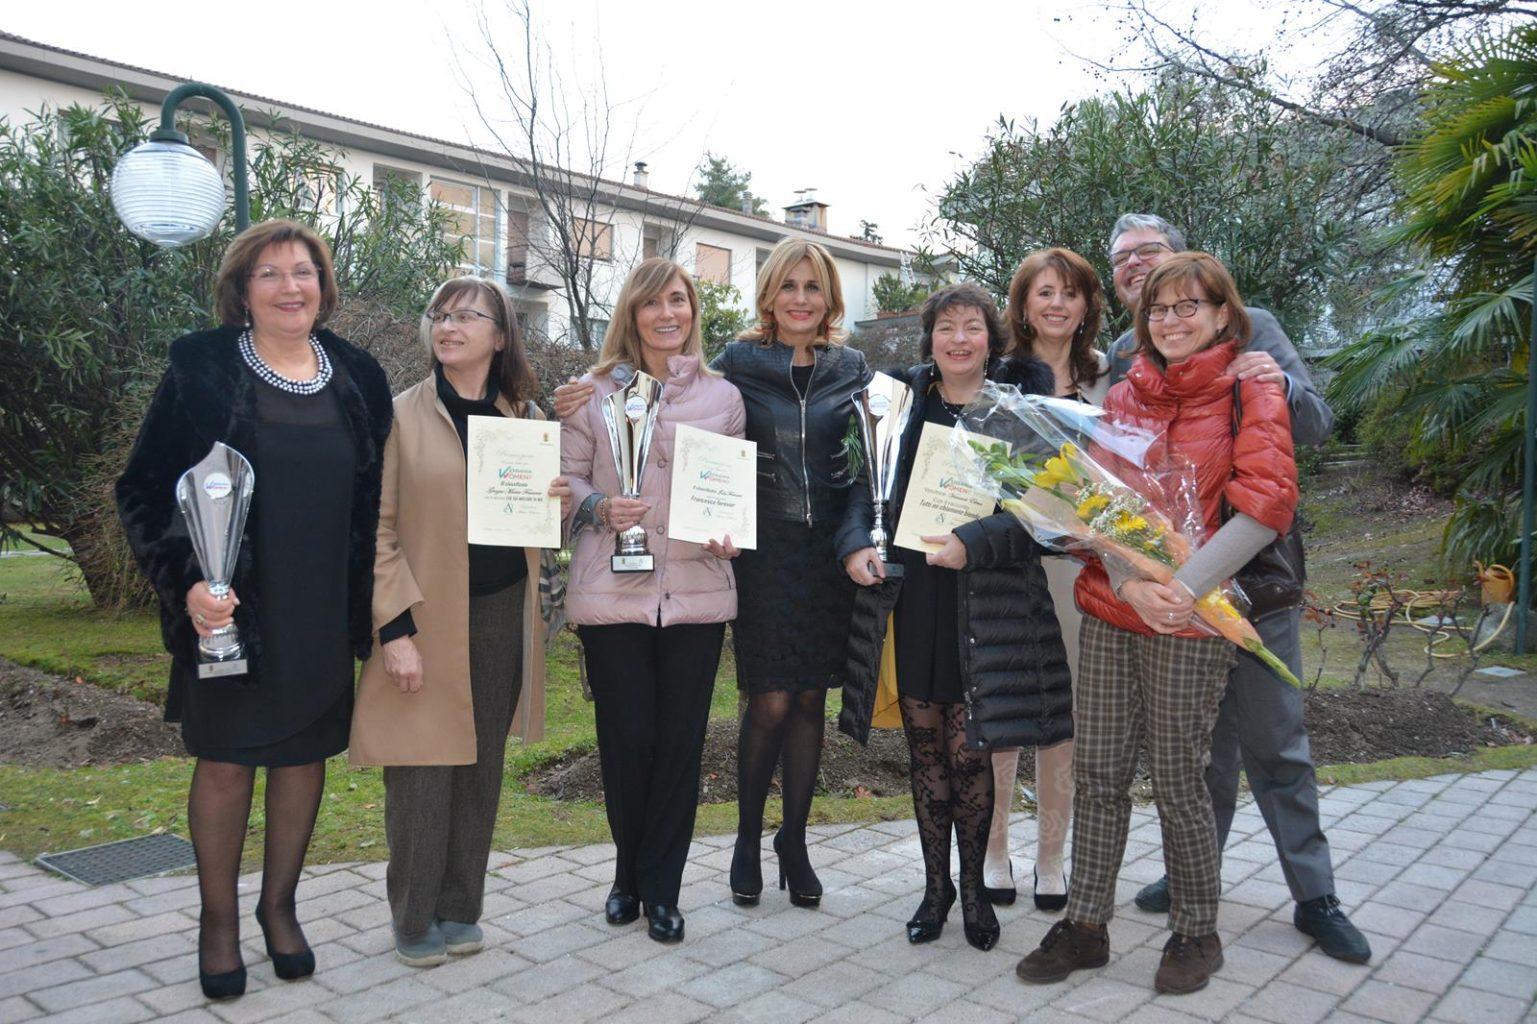 Premio letterario Verbania for Women